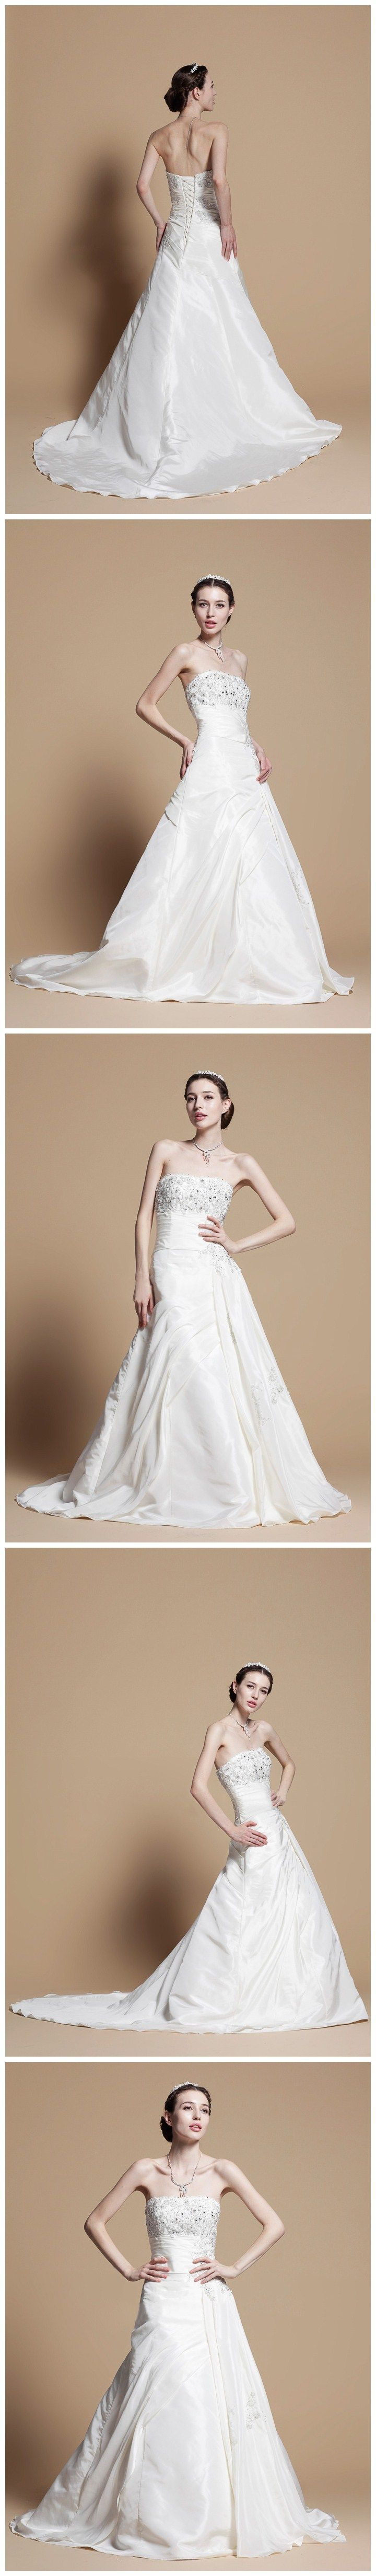 16 best my dream wedding images on pinterest wedding dressses